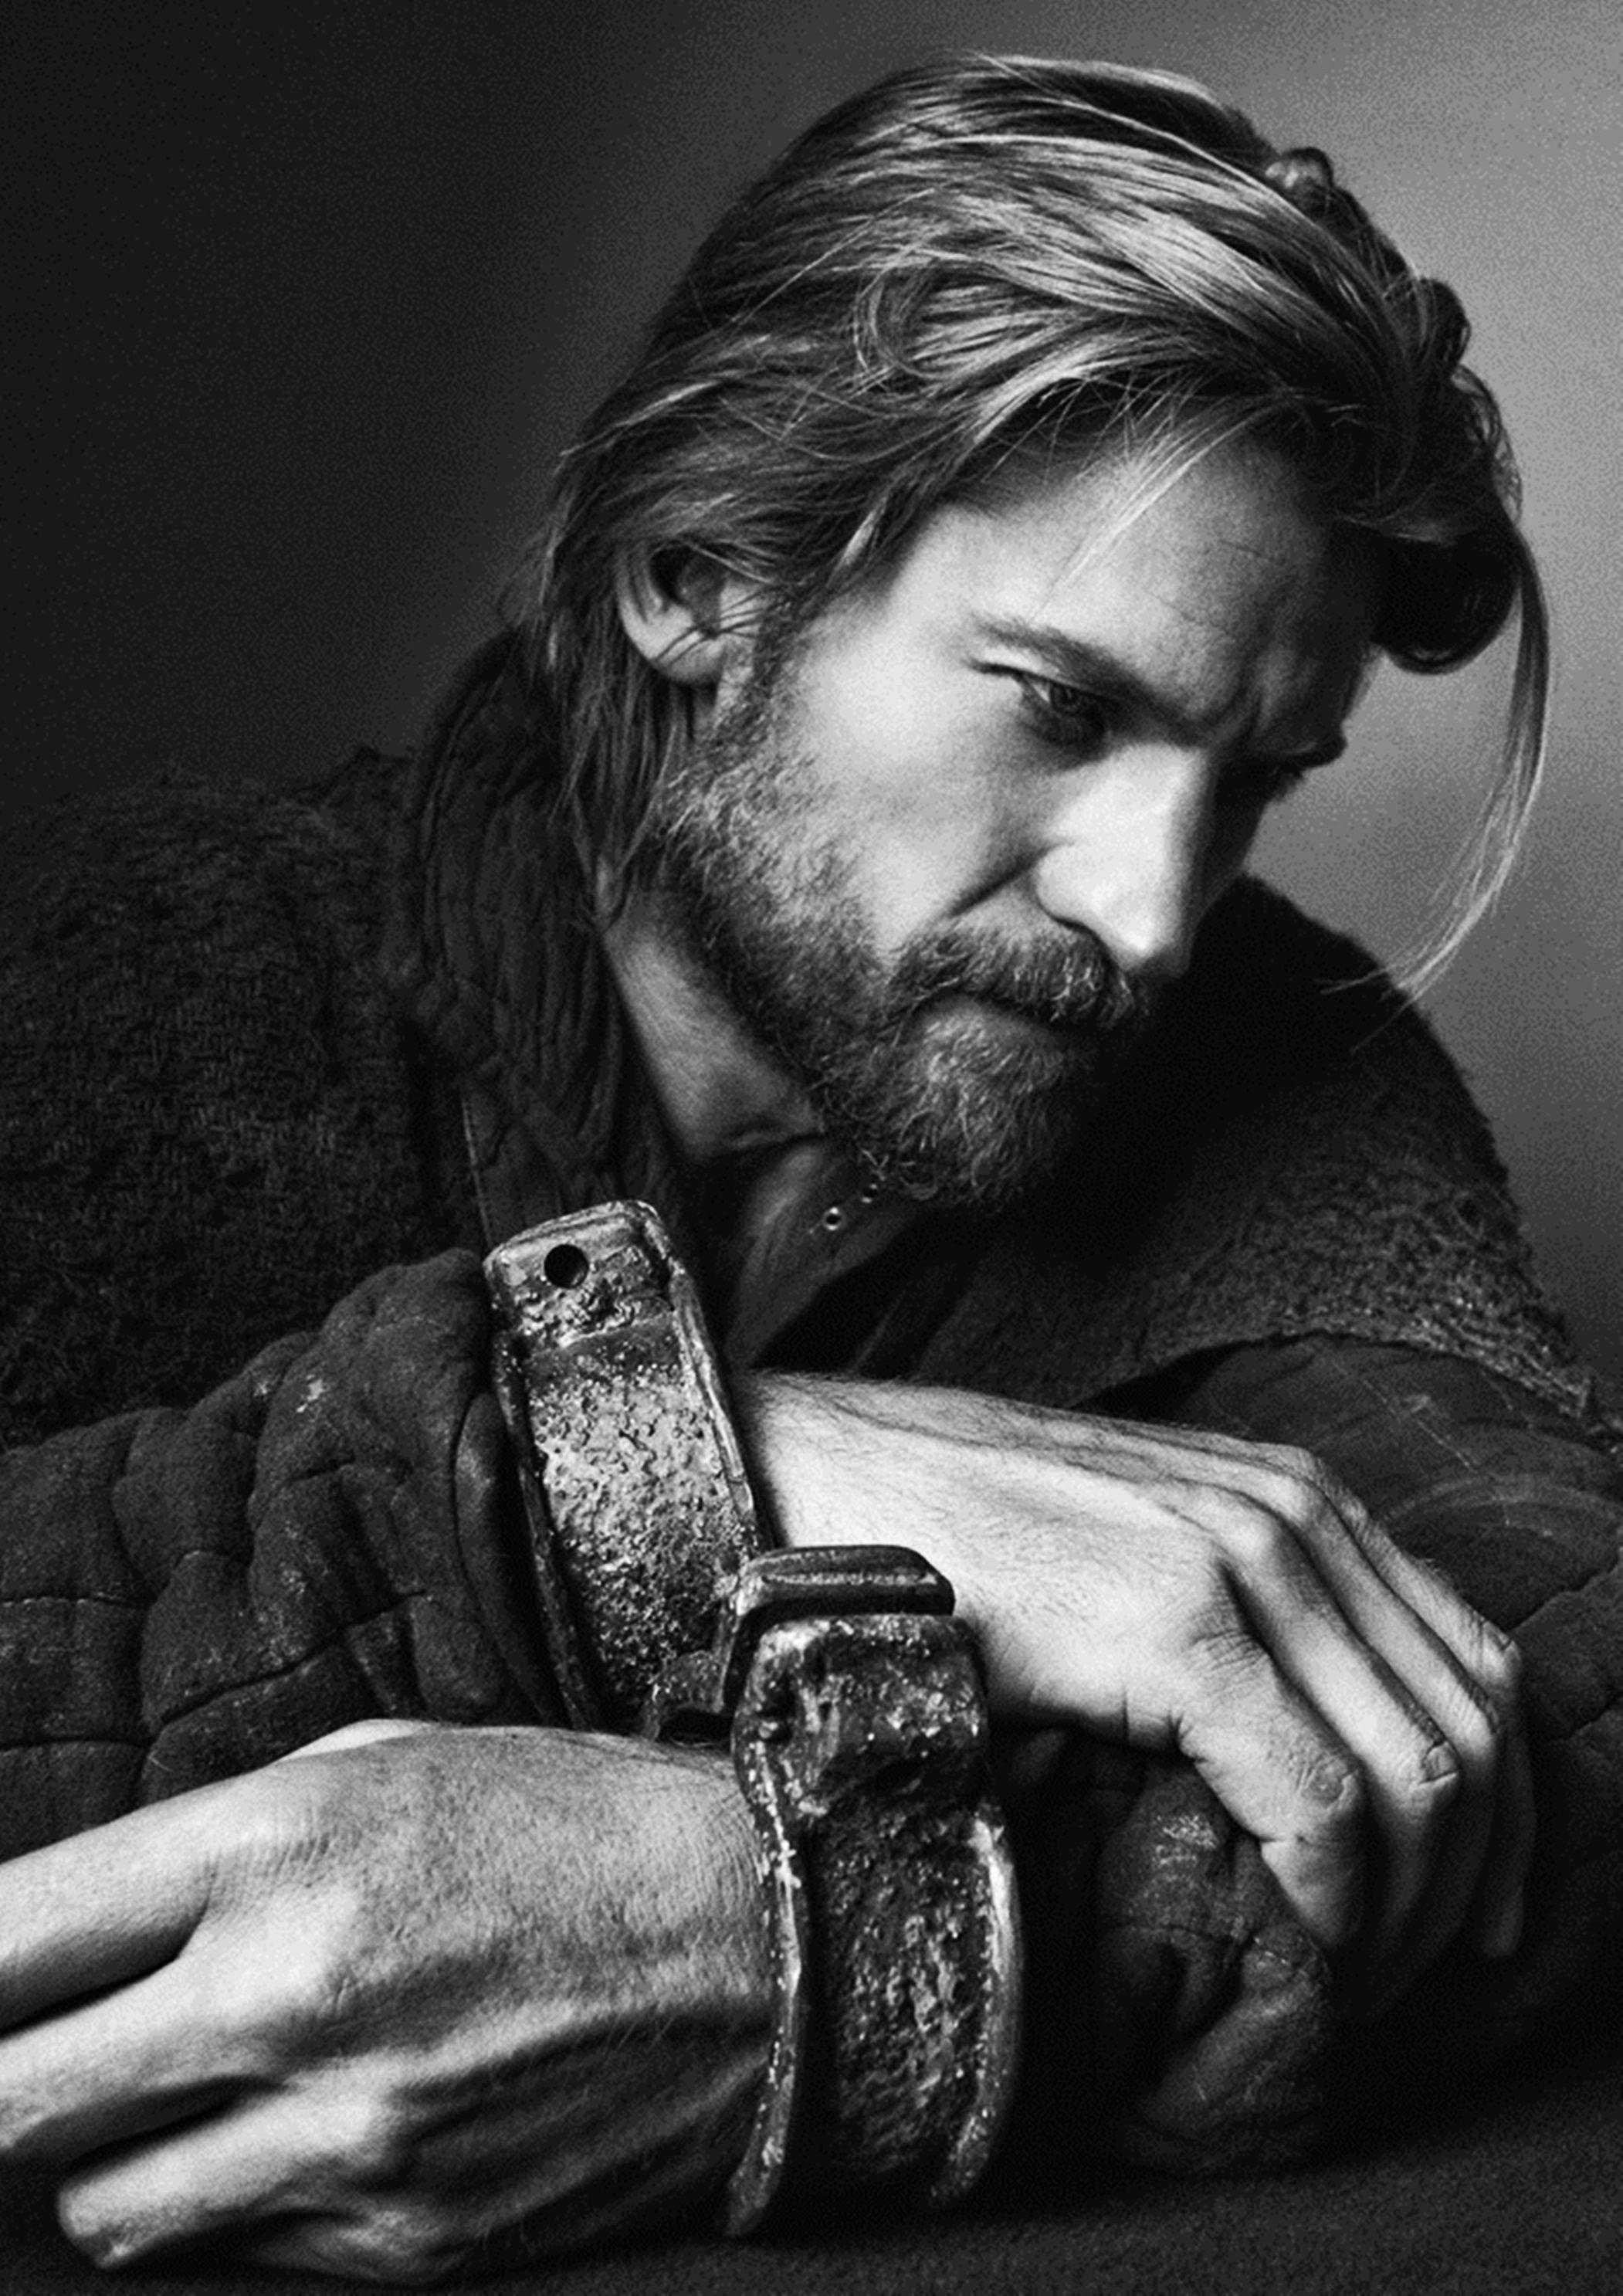 Nikolaj Coster-Waldau as Jaime Lannister. Tis a love/hate ...